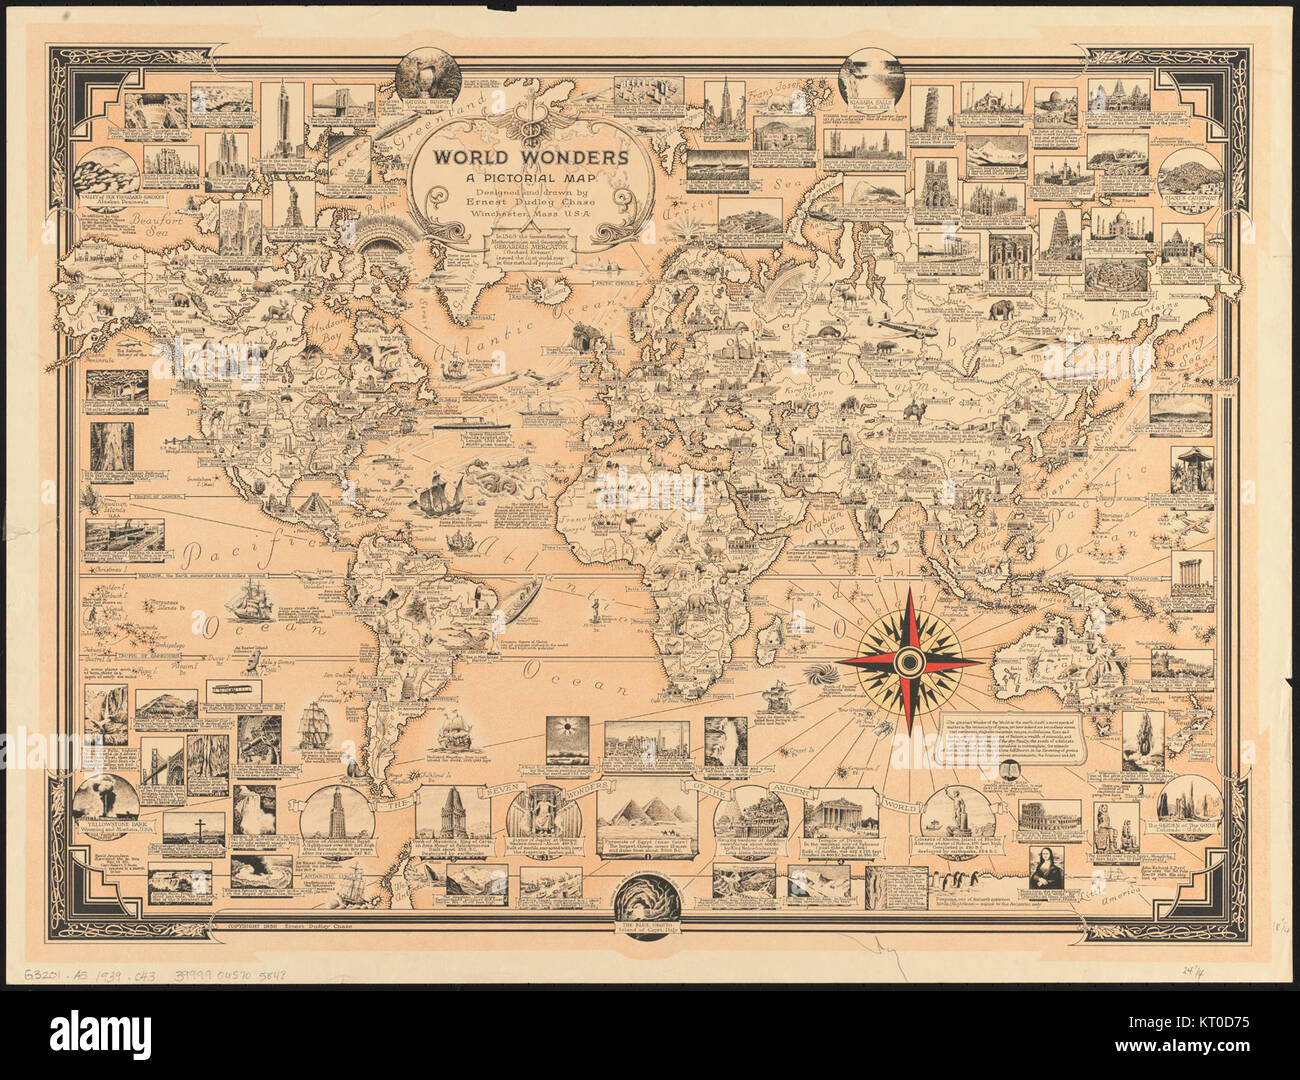 1939 World Map Stock Photos & 1939 World Map Stock Images - Alamy